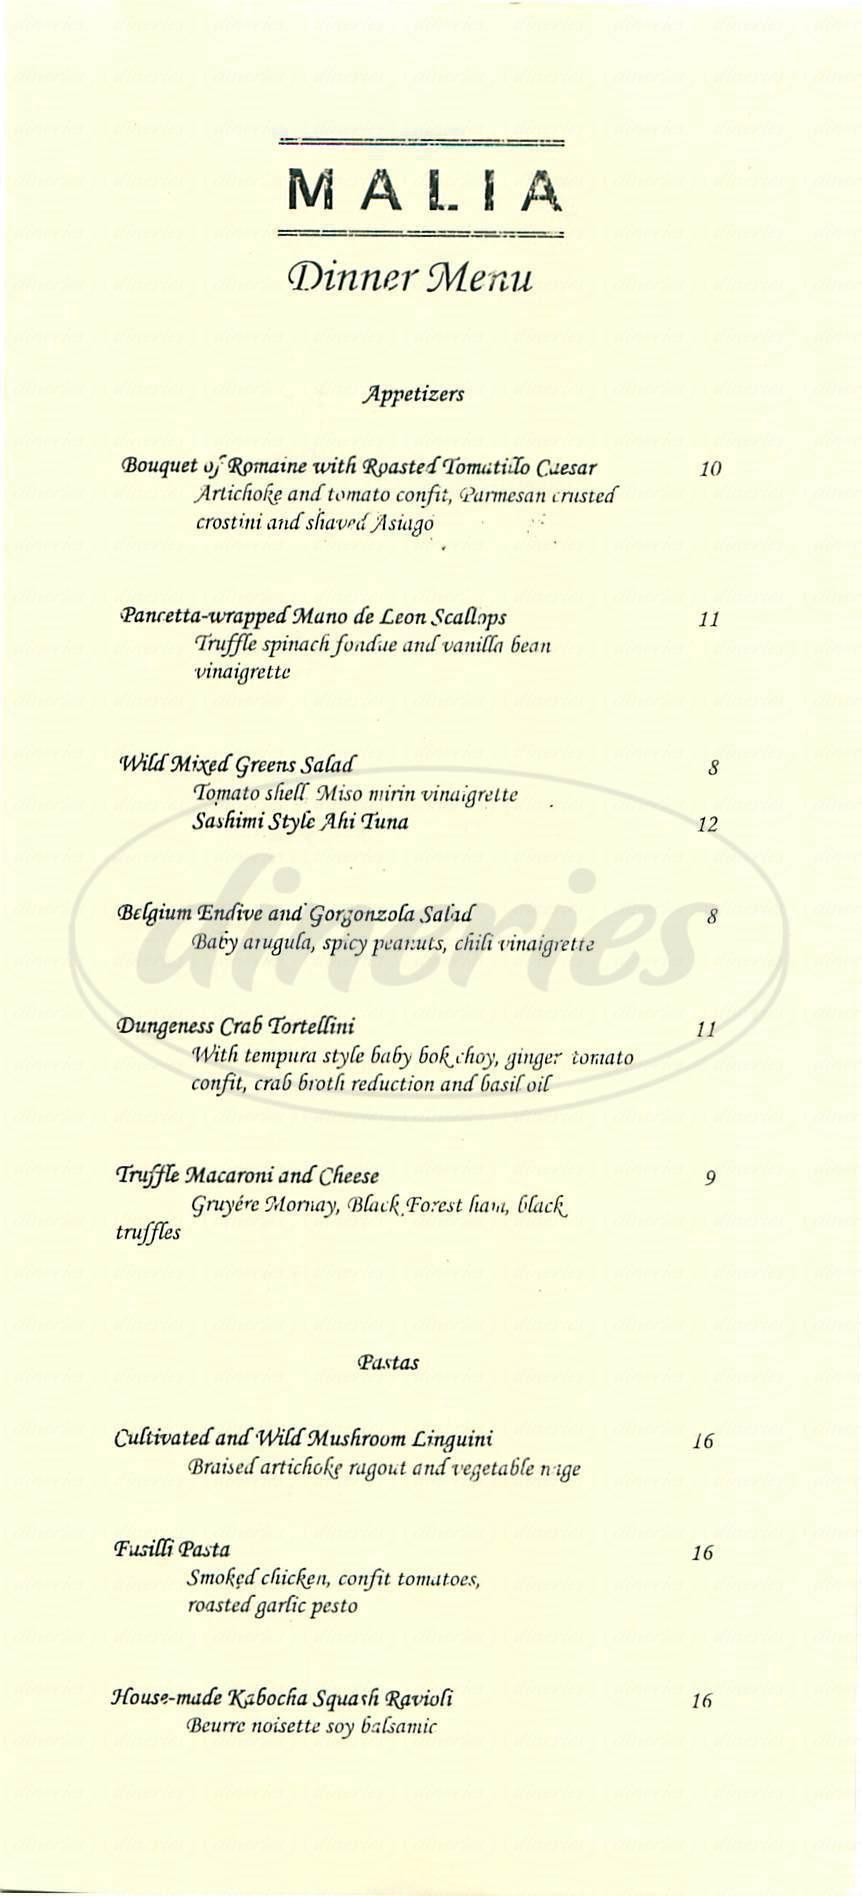 menu for Malia